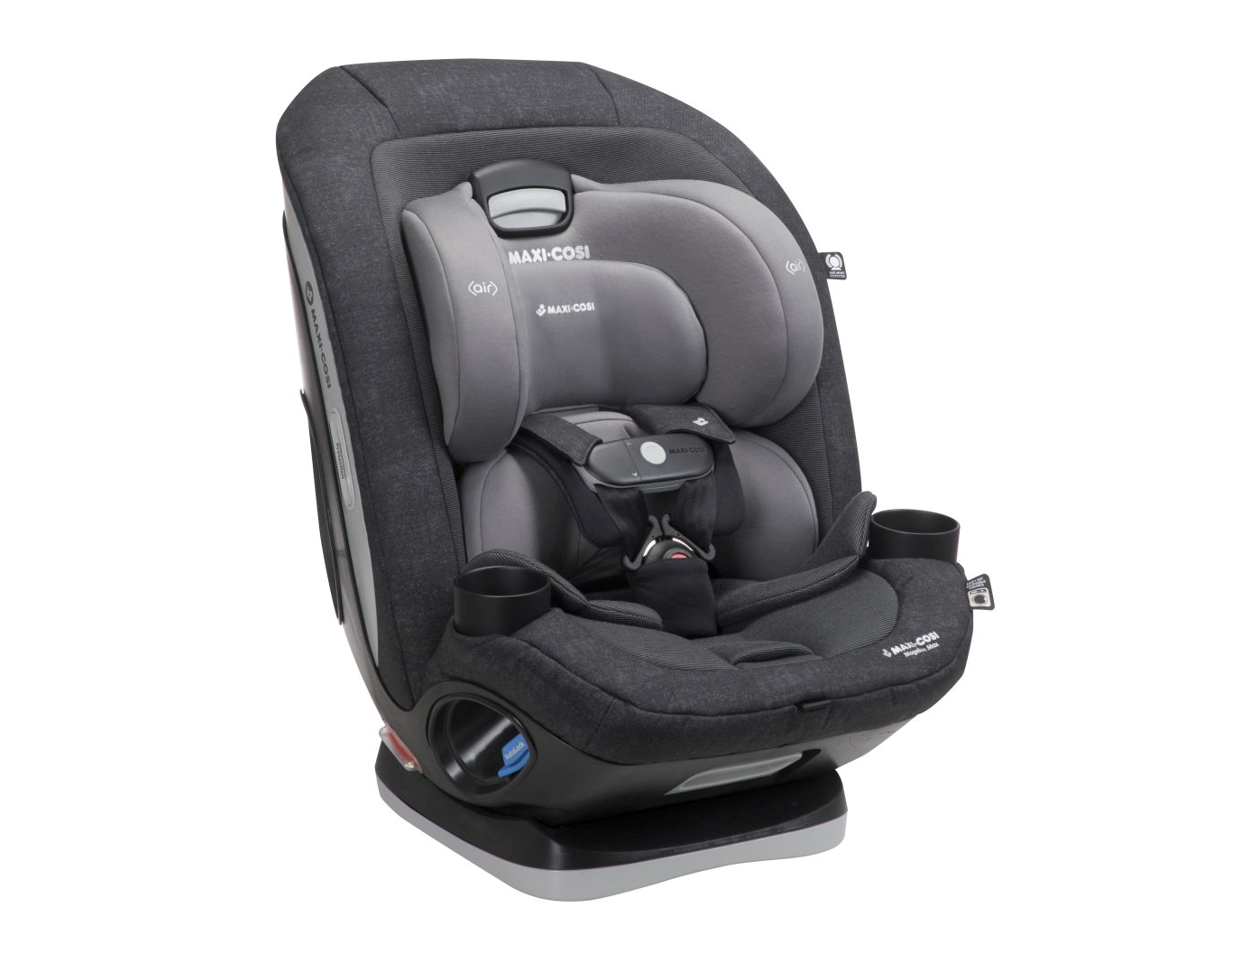 Maxi Cosi Magellan Max 5-in-1 Convertible Car Seat